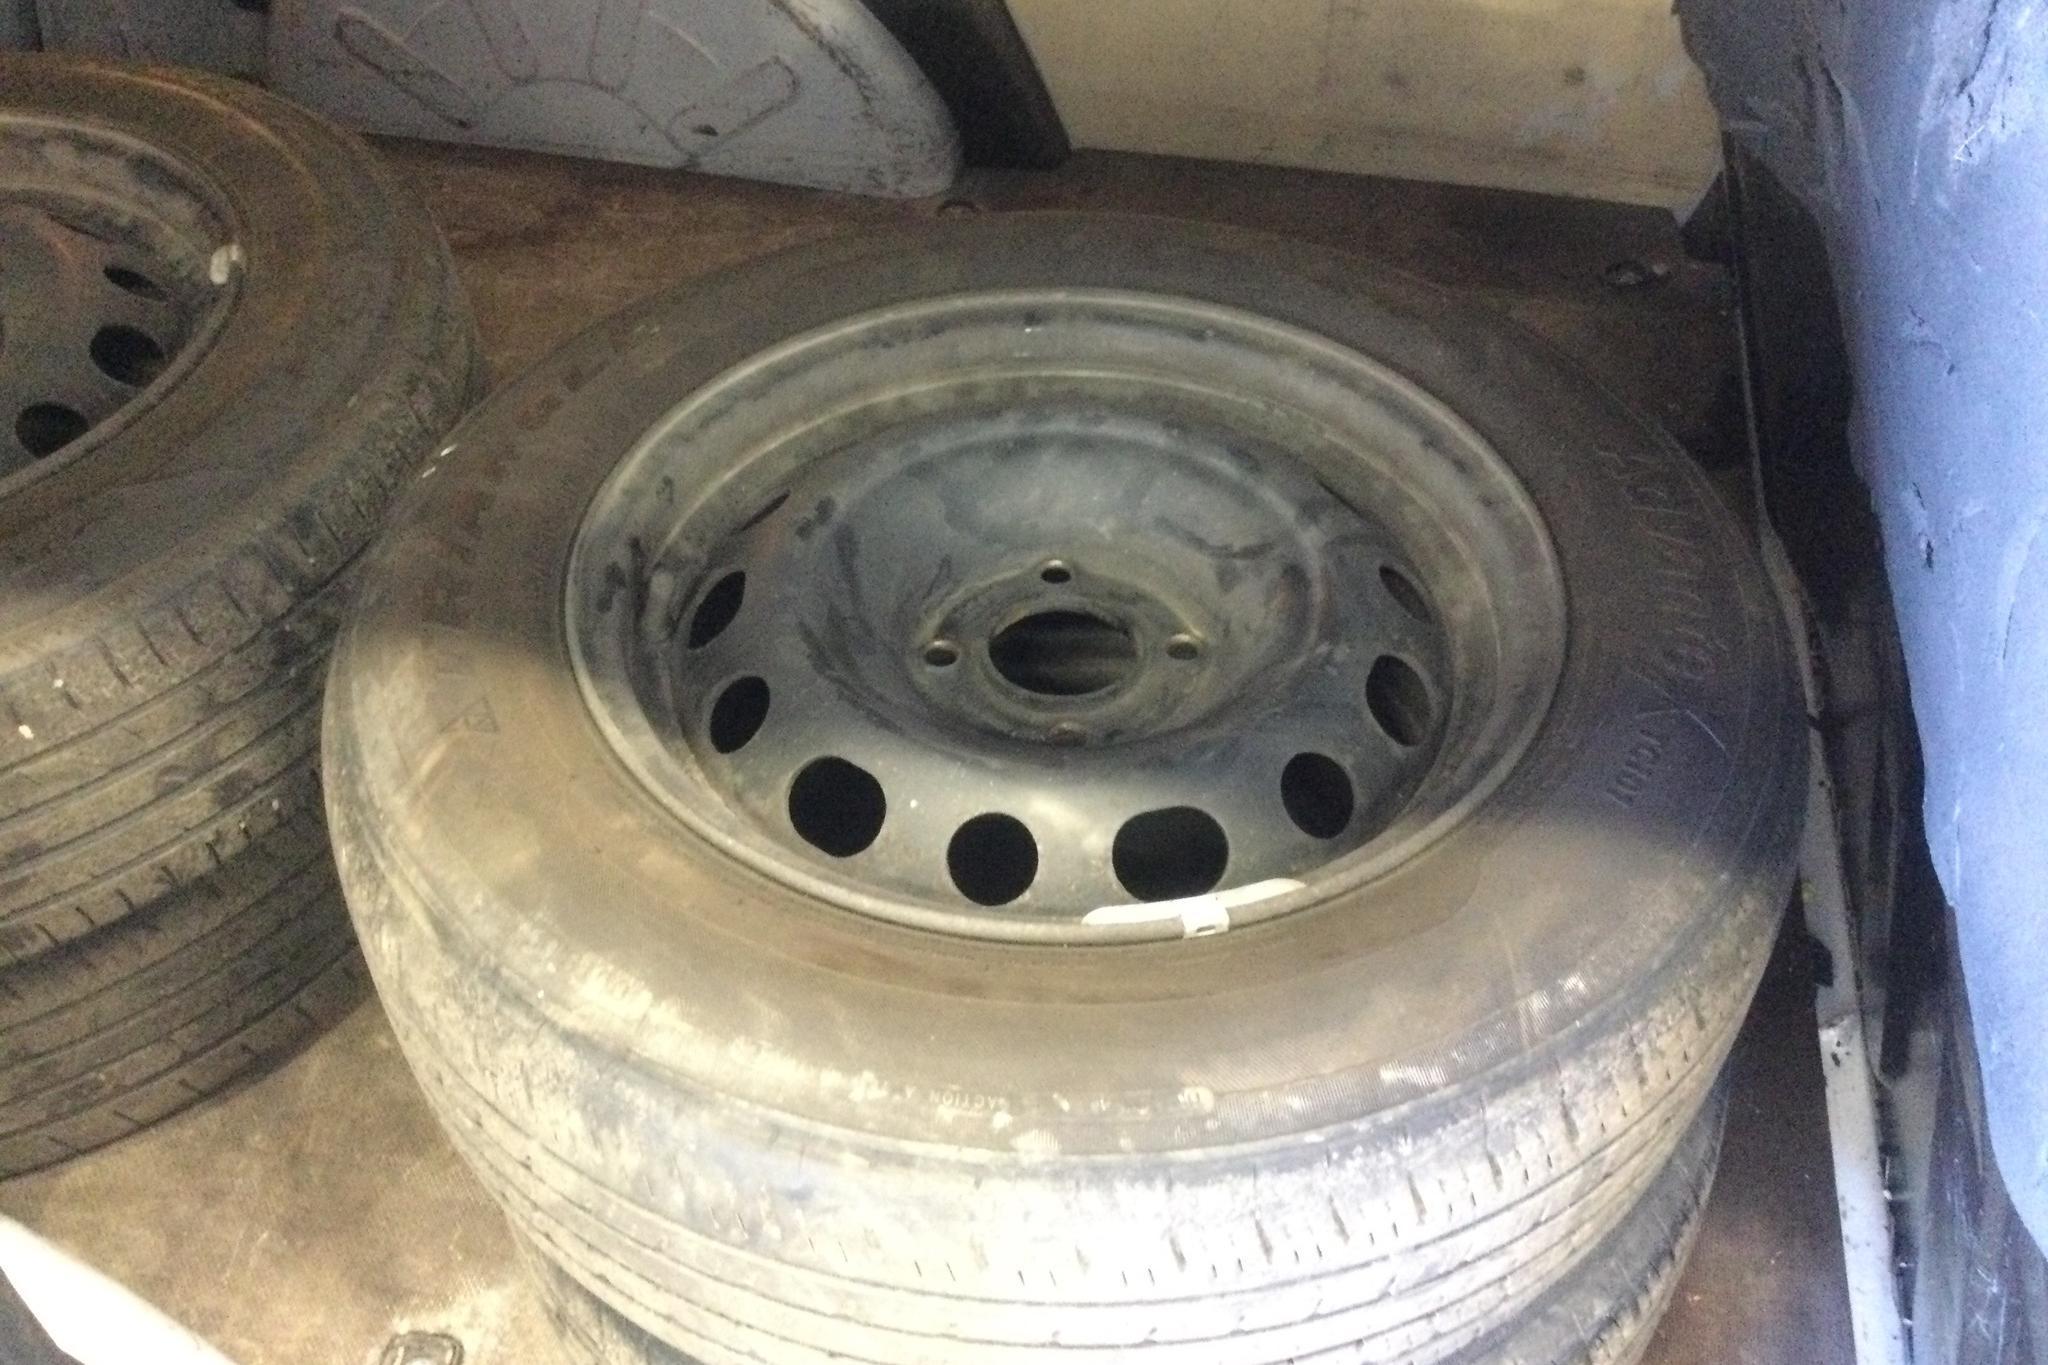 Mercedes Citan 109 1.5 CDI (90hk) - 13 164 mil - Manuell - vit - 2013